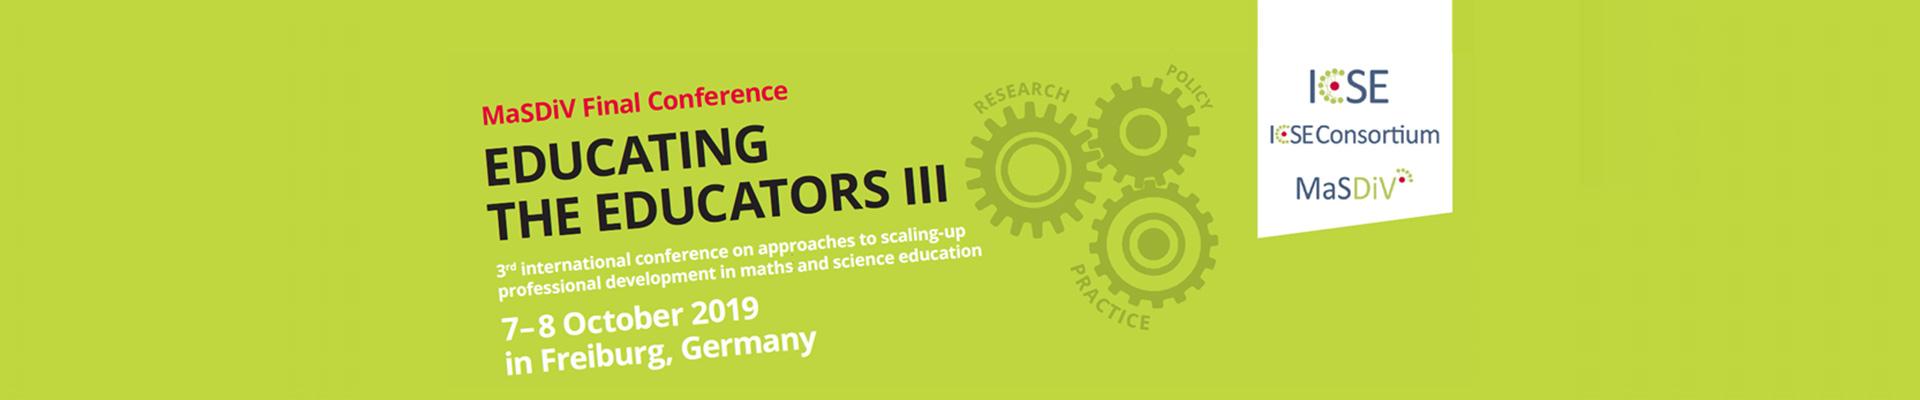 "International Conference ""Educating the Educators III"" – ICSE"